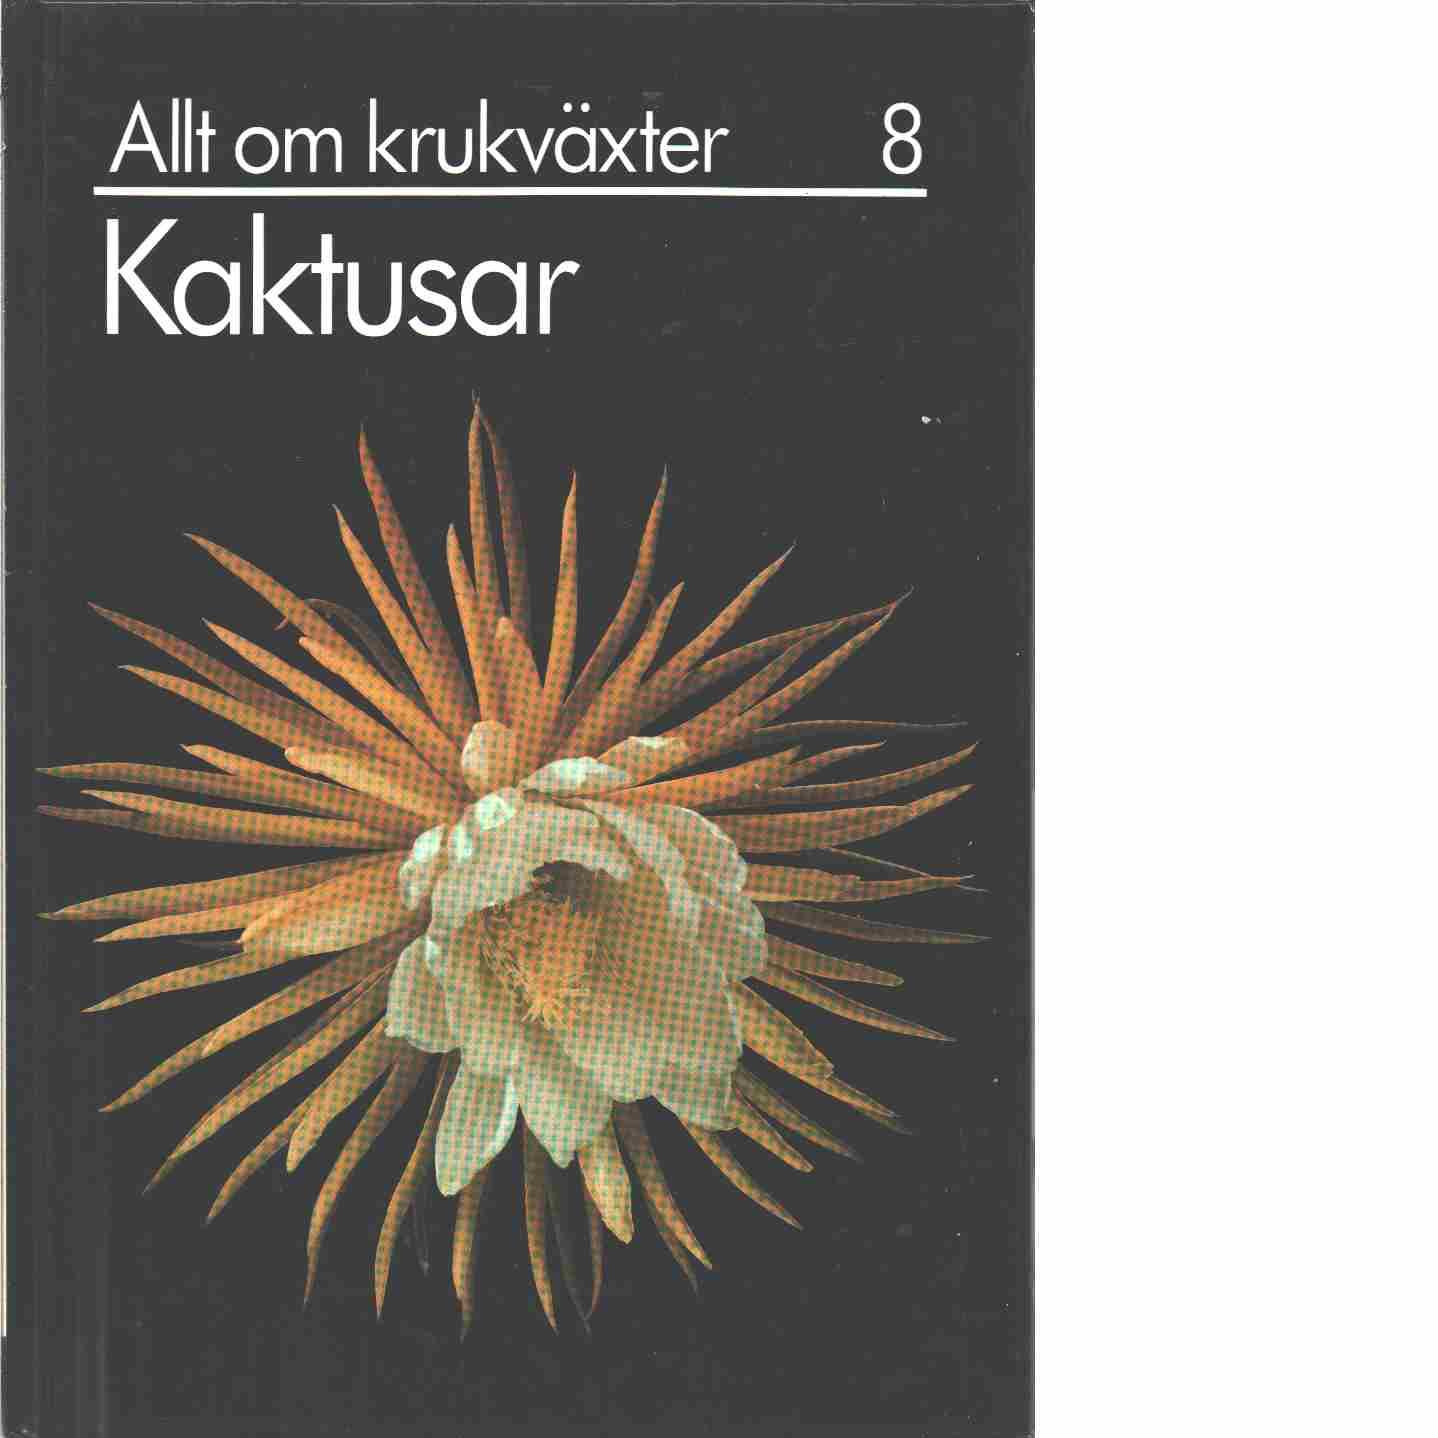 Allt om krukväxter. 8, Kaktusar  - Red. Furusjö, Maja-Lisa